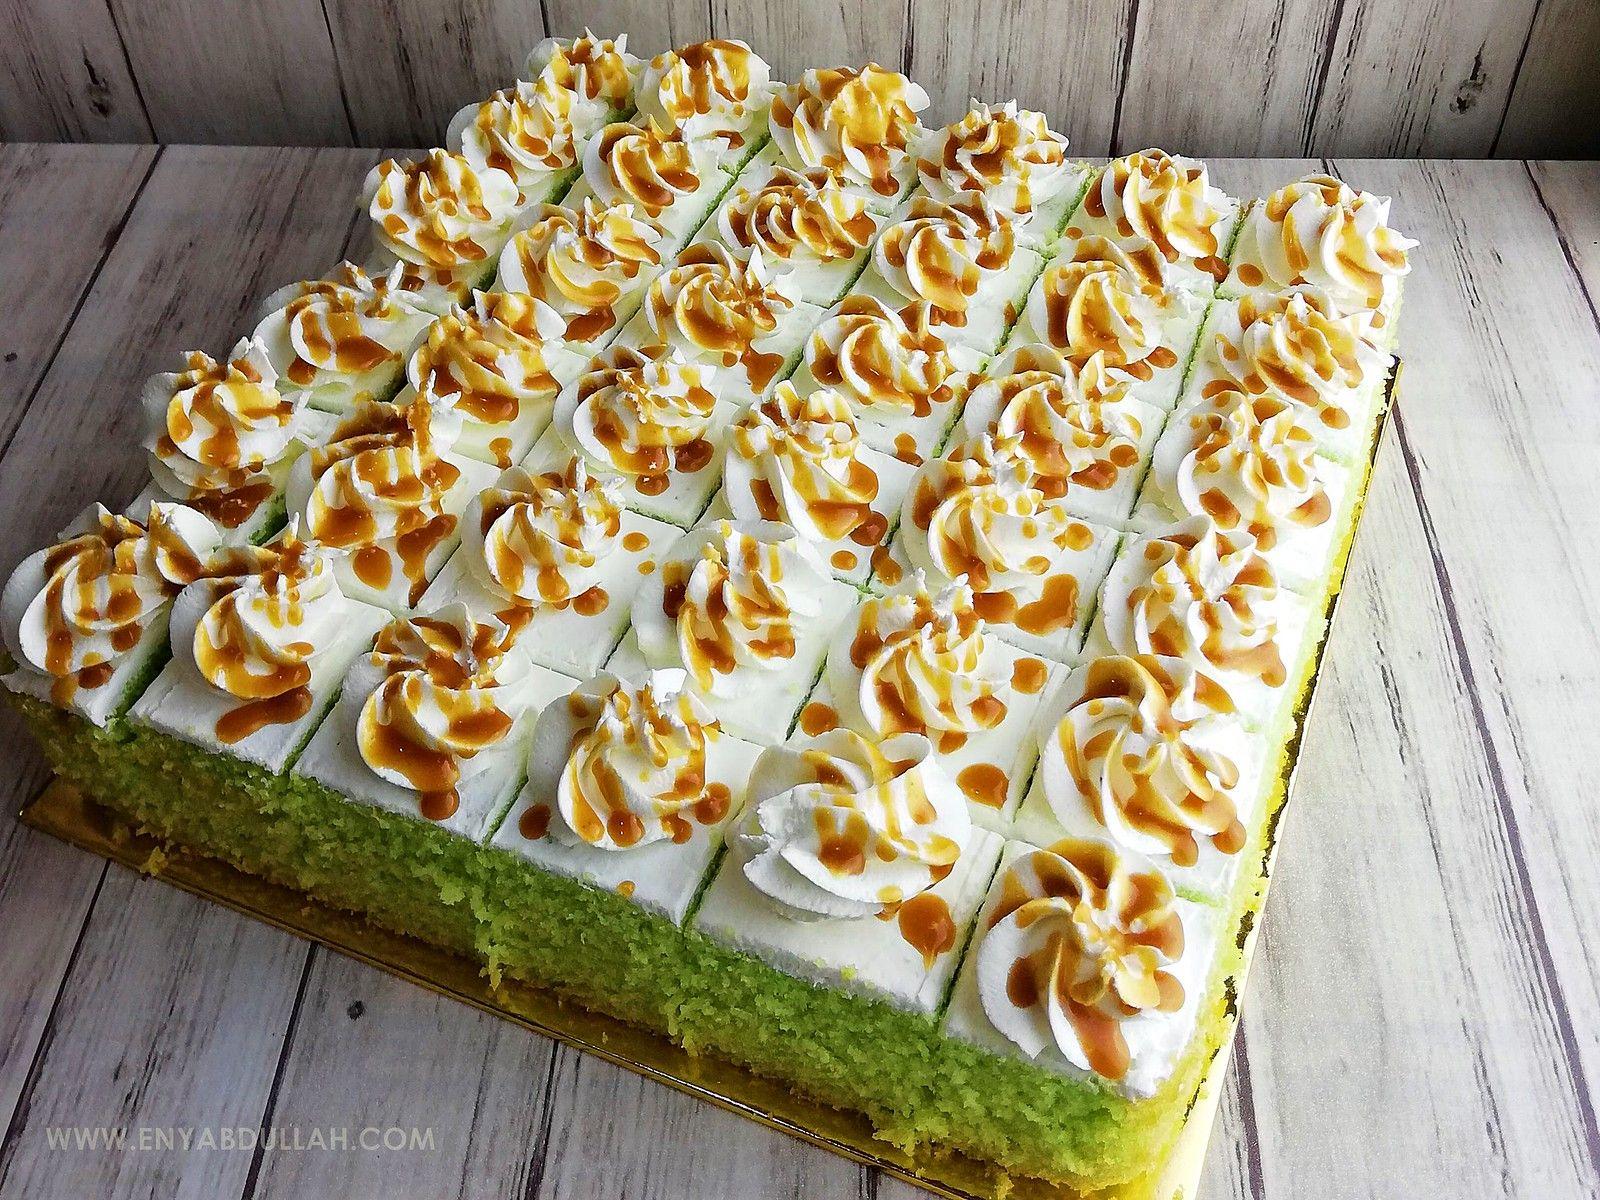 IMG_20180707_012434ED | Food, Bolu cake, Wedding desserts